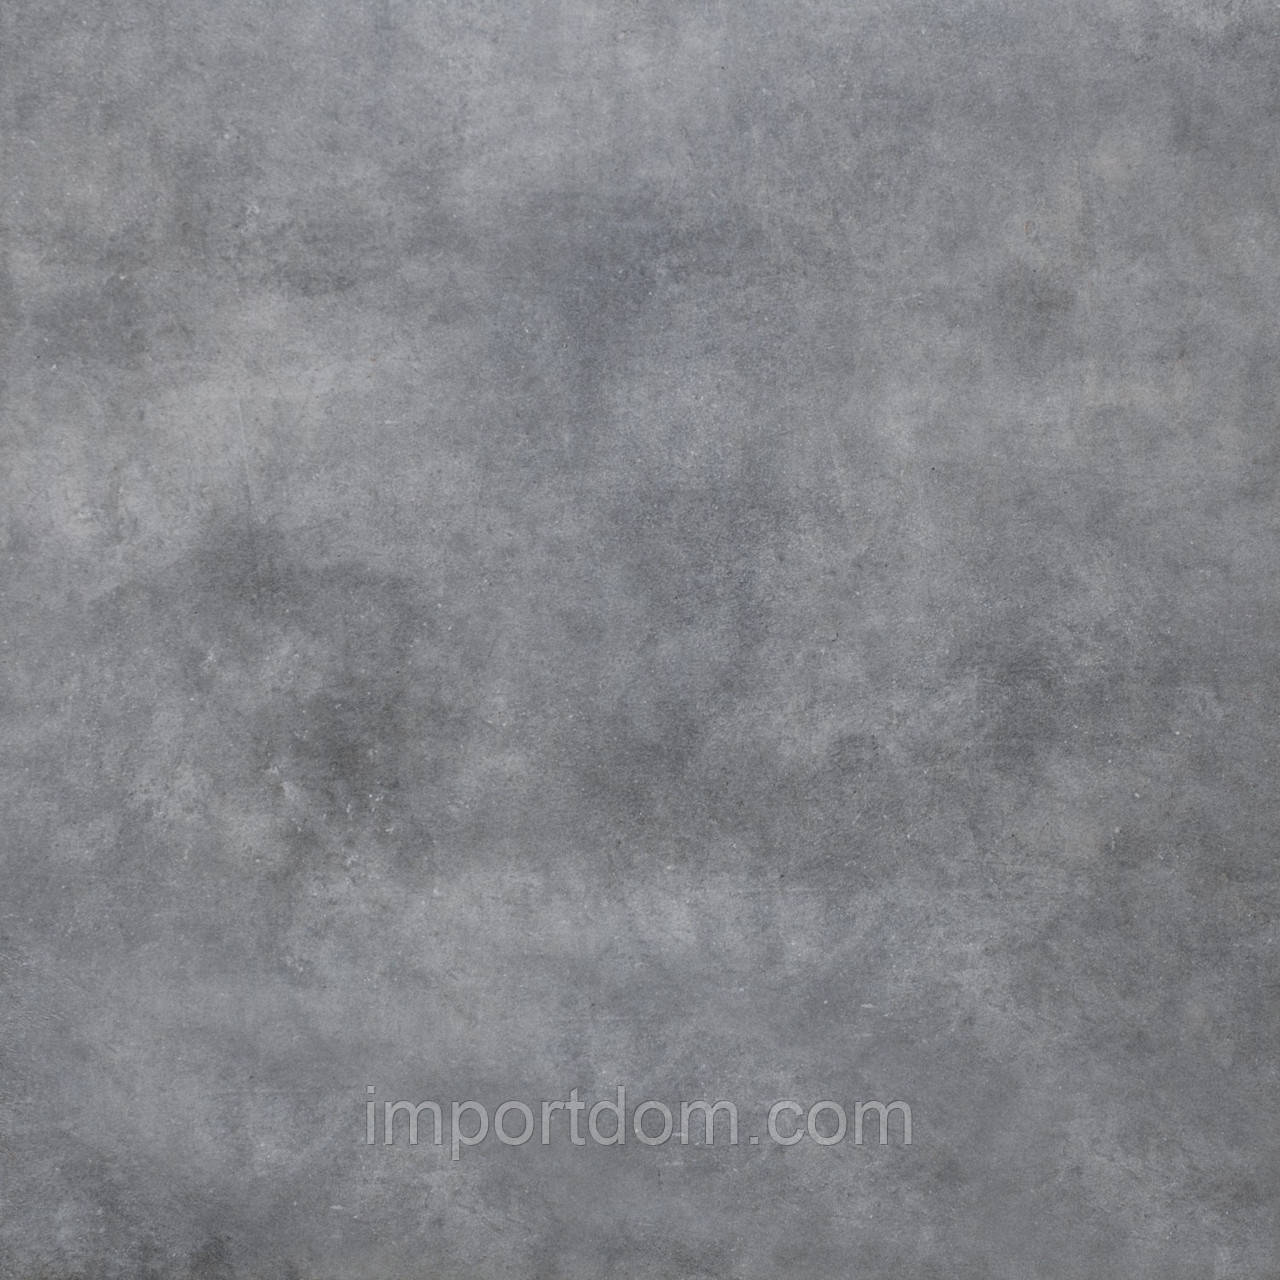 Плитка для пола Cerrad Batista Steel 600х600х8,5